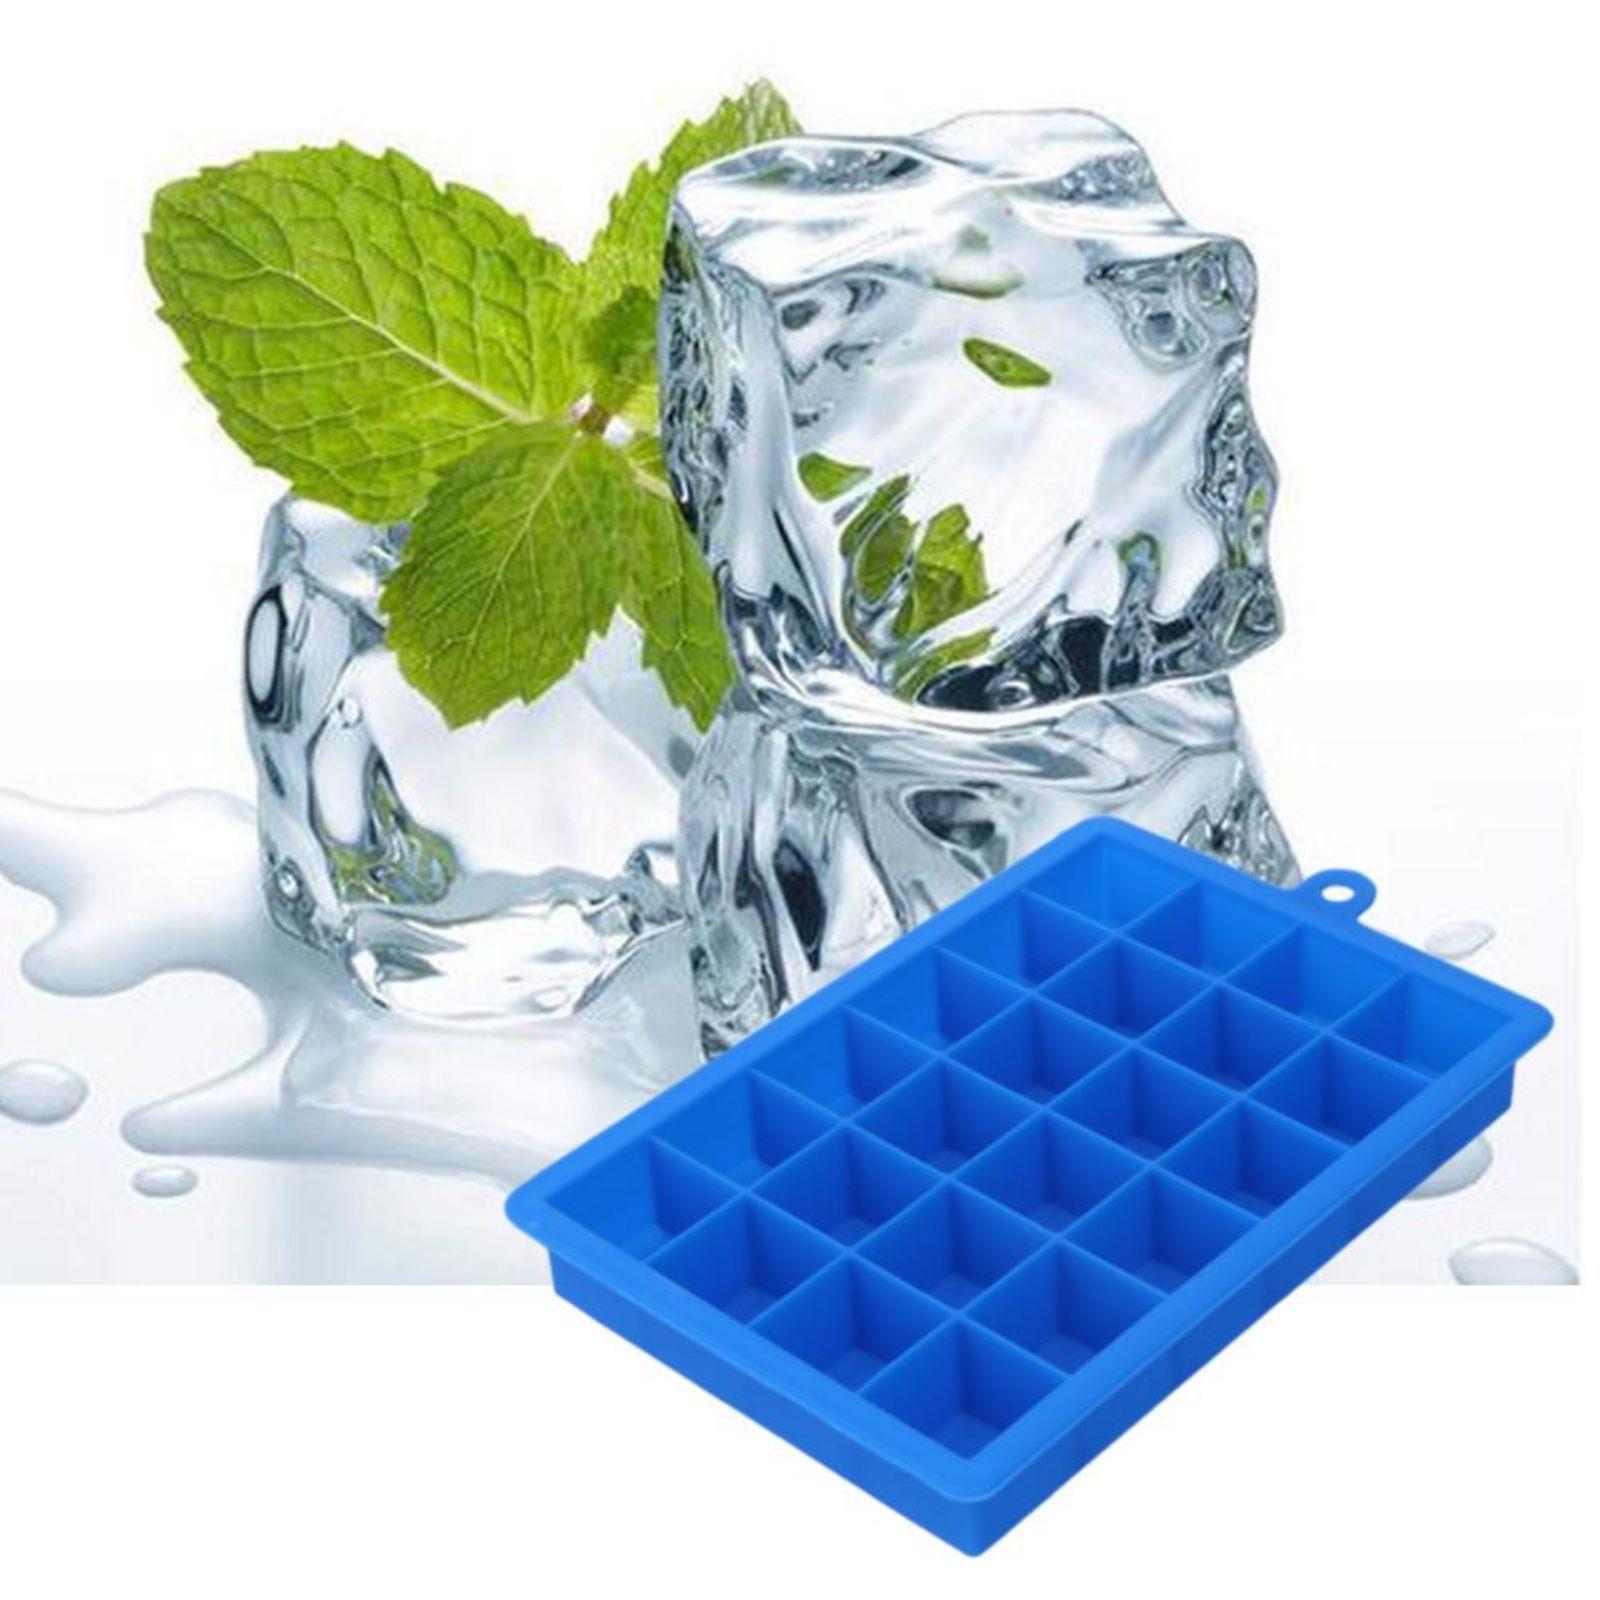 DIY Ice Cube Mold Square Shape Silicone Tray Fruit Ice Cream Maker Kitchen Tool